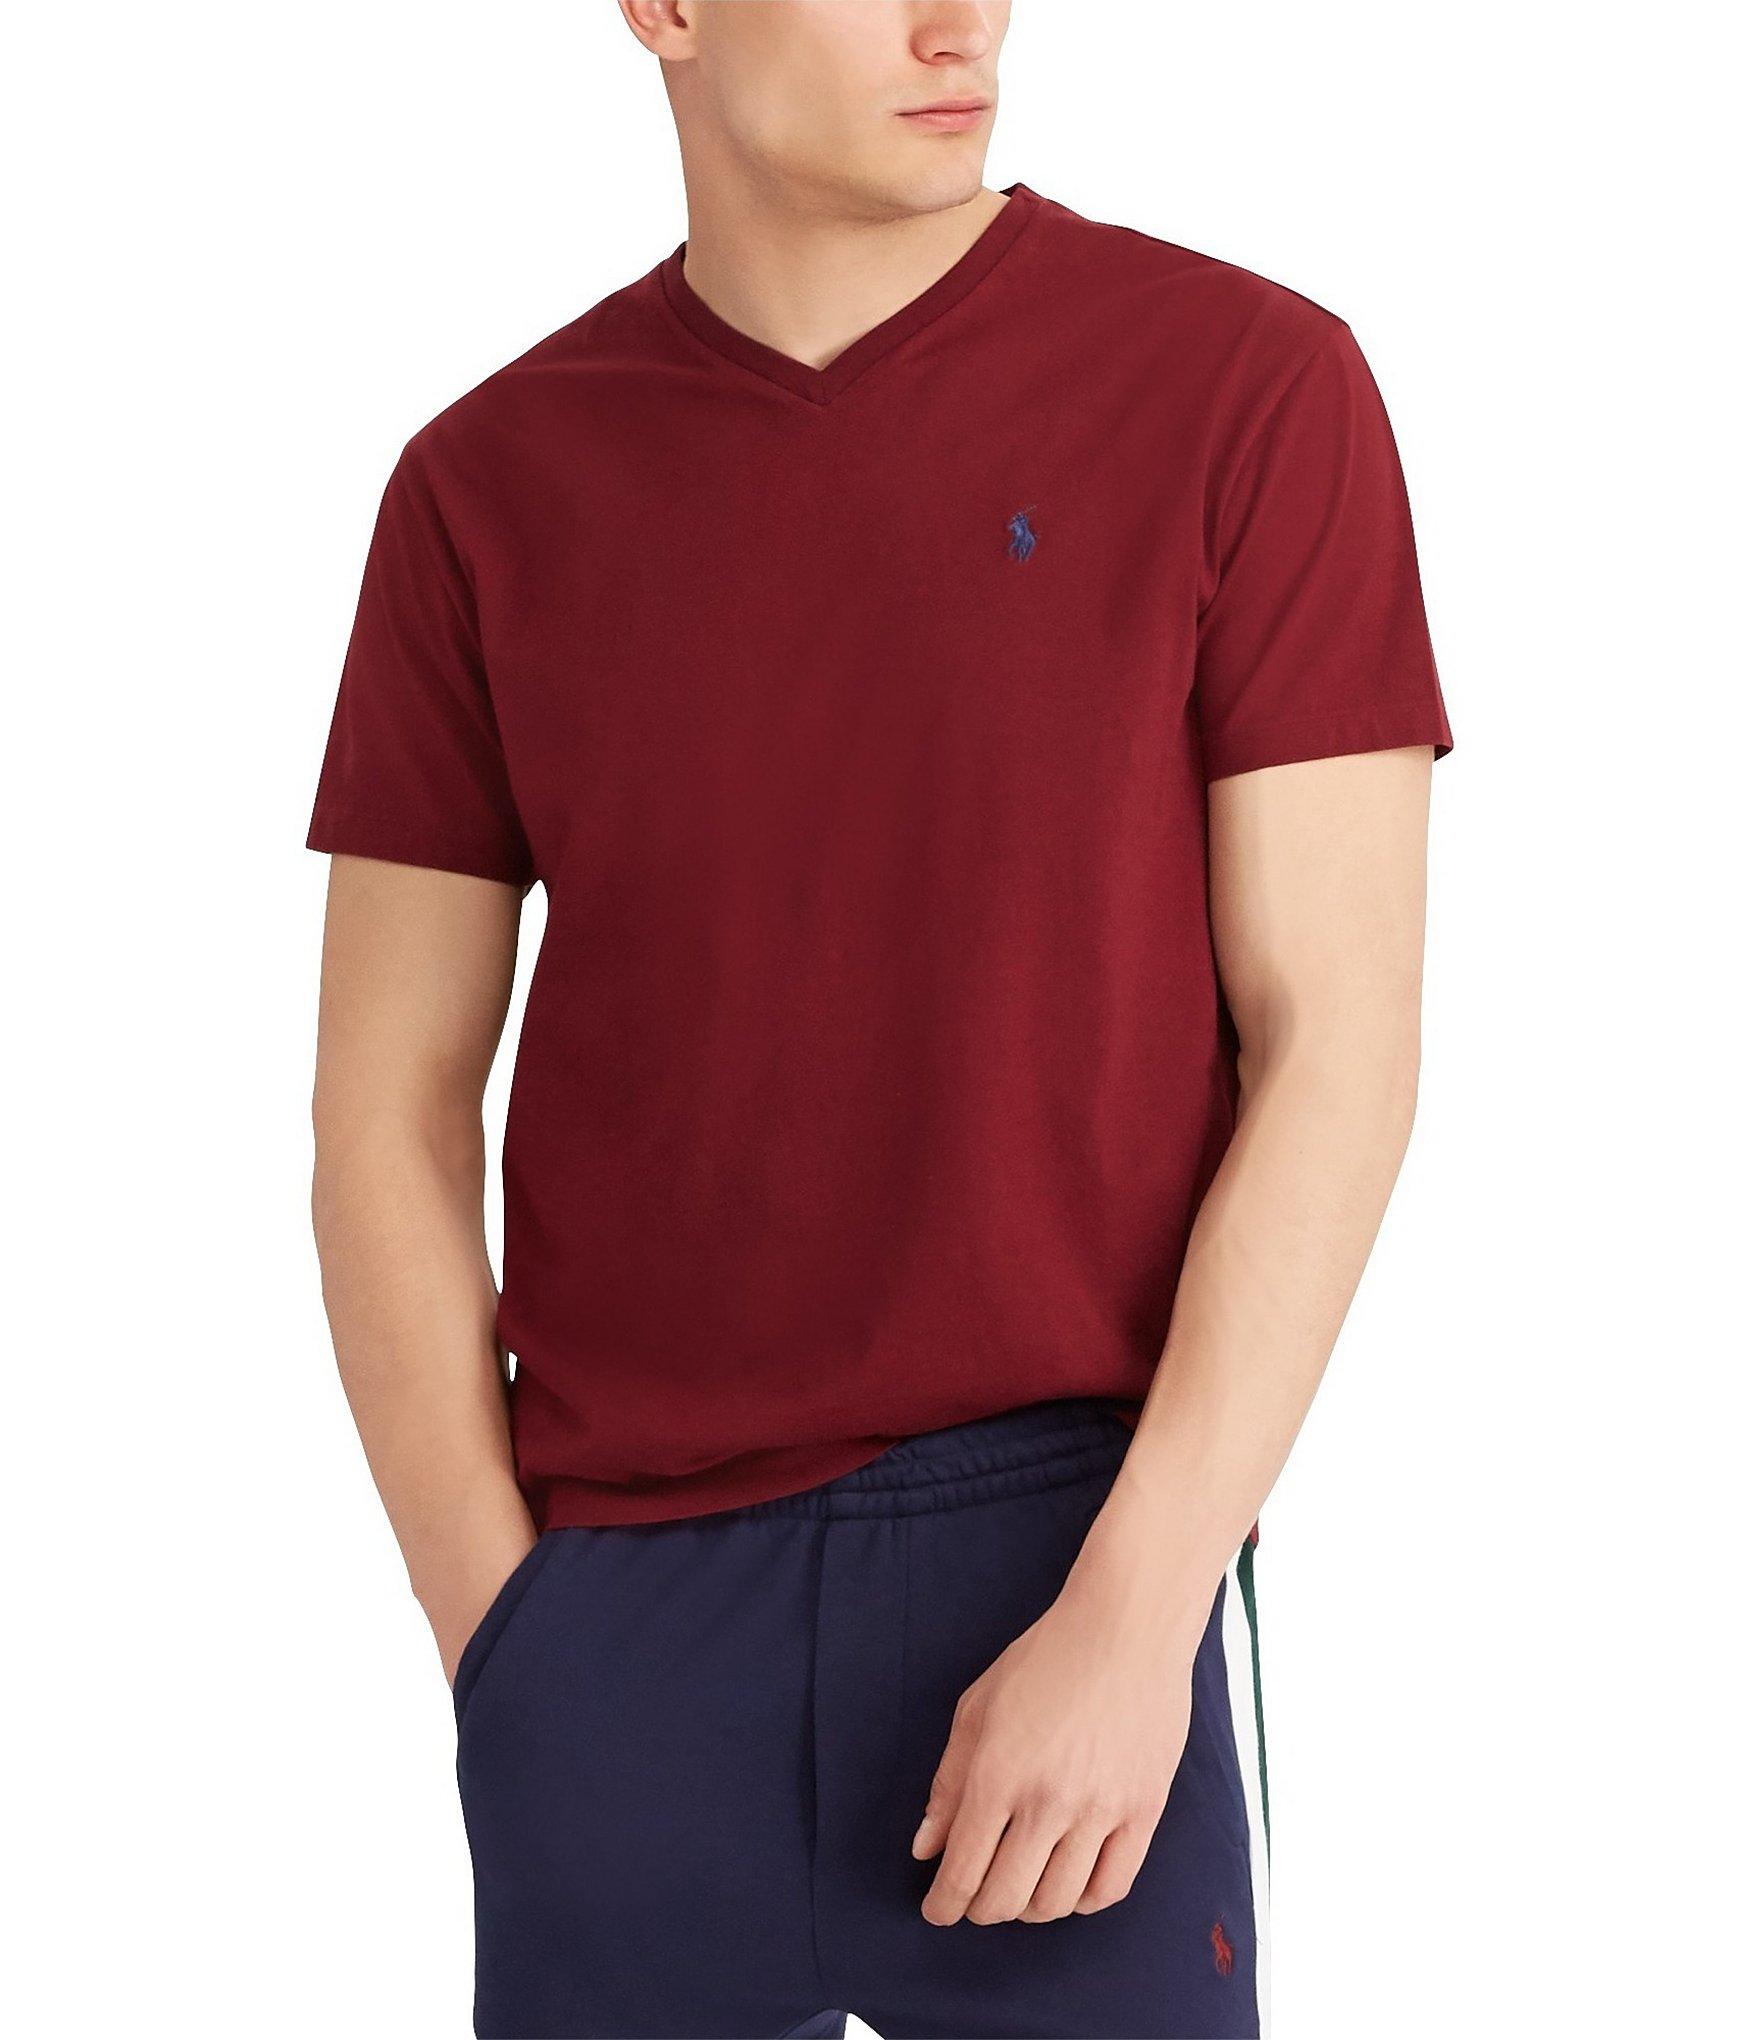 af89d2dea4f0e Polo Ralph Lauren Classic-Fit Short-Sleeved Cotton Jersey V-Neck Tee